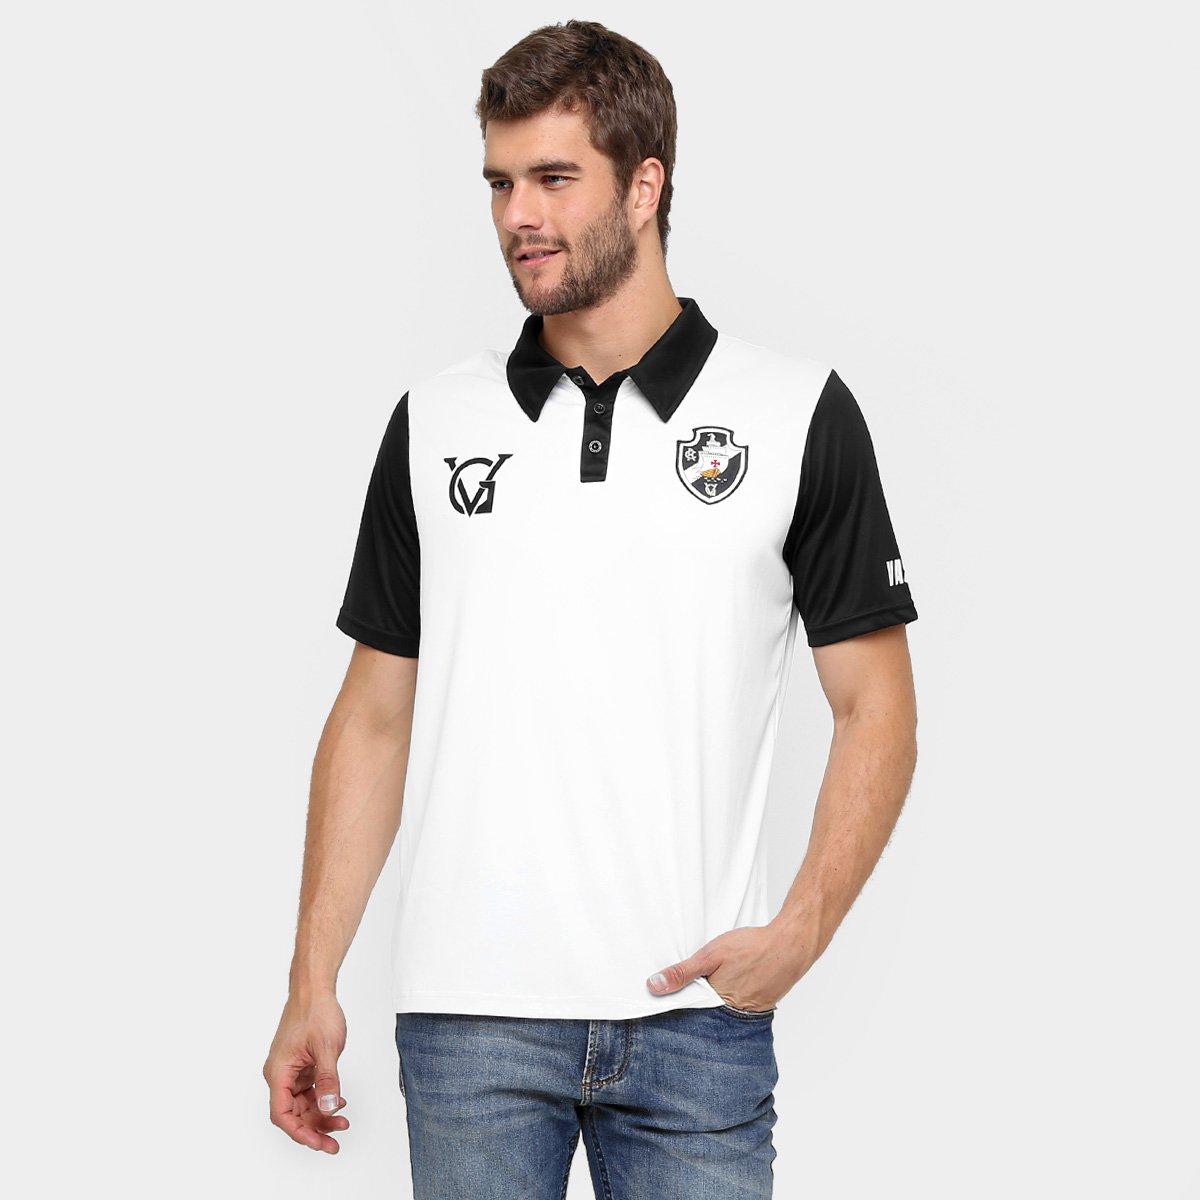 Camisa Polo Vasco Dry Masculina - Compre Agora  92b6b2c02d2f4